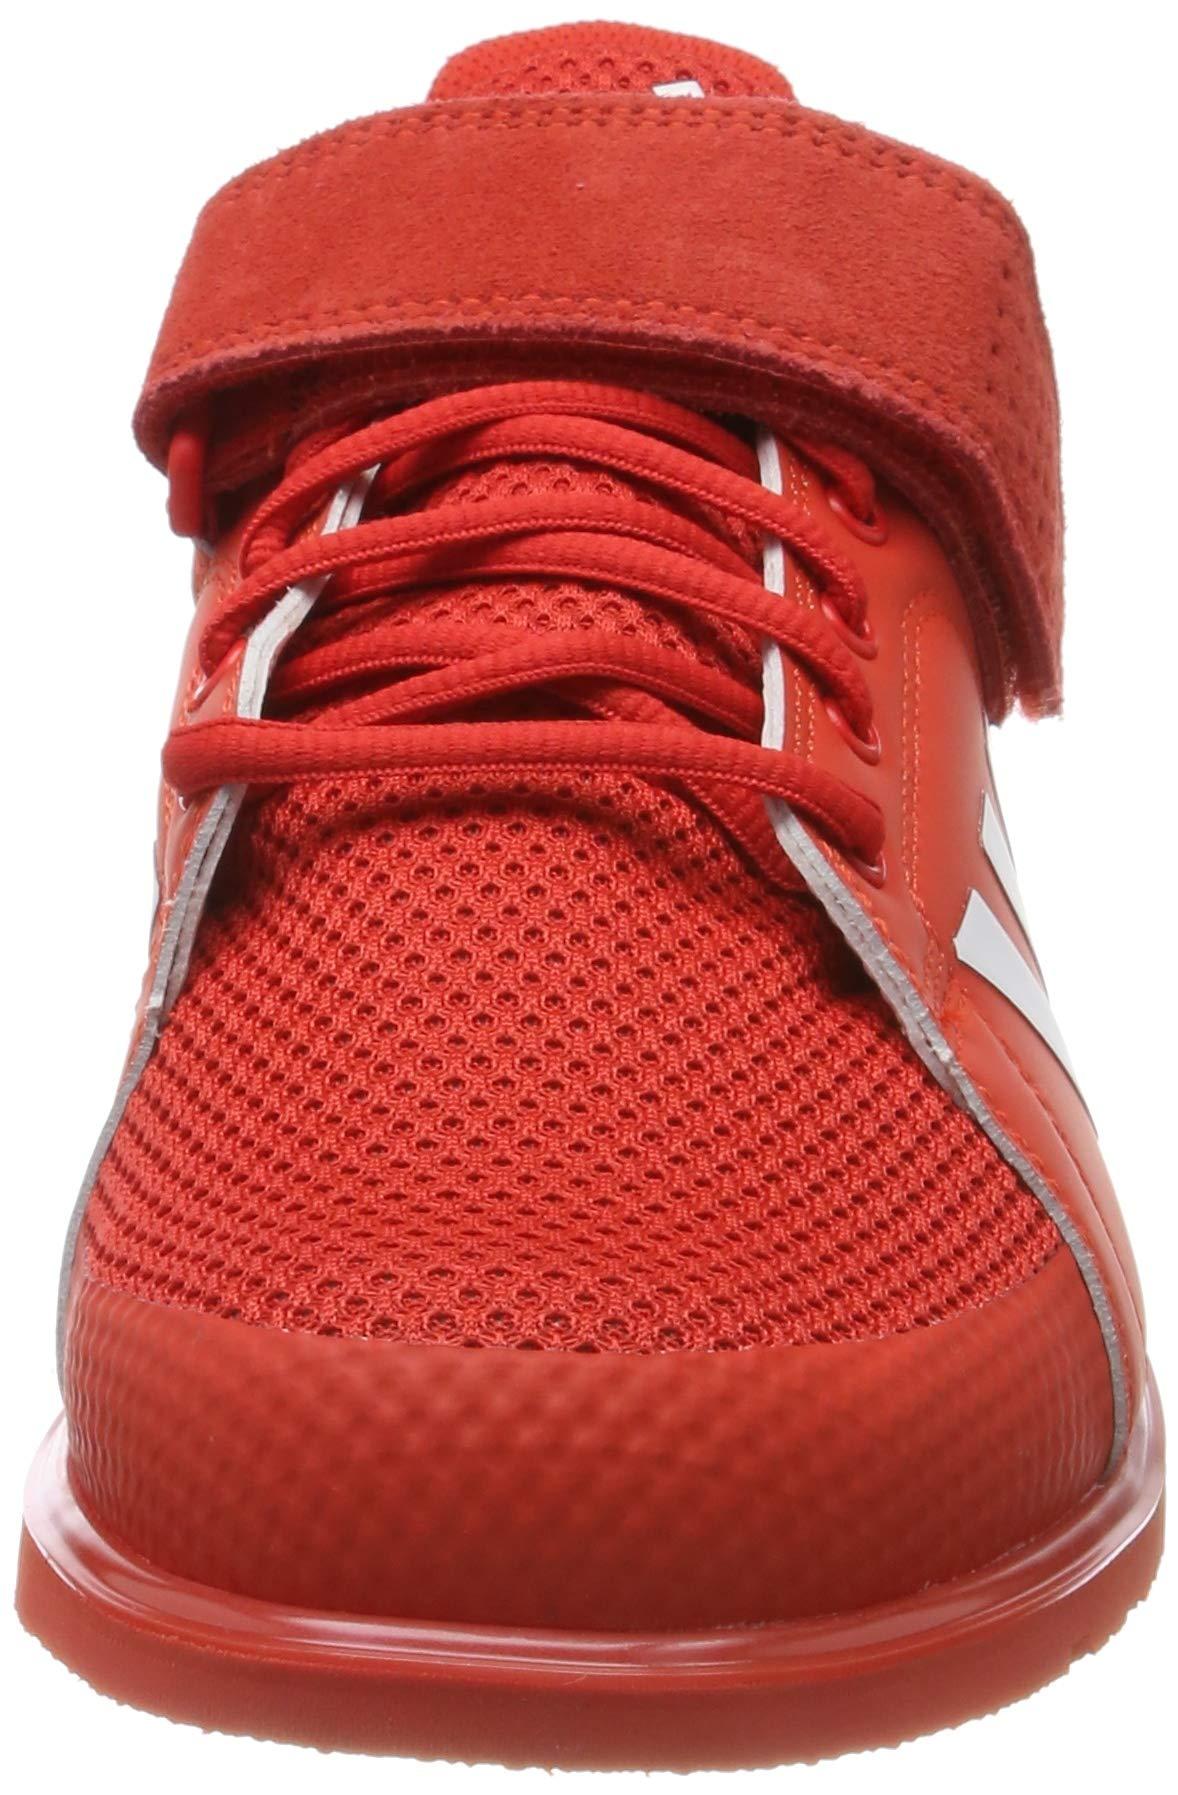 adidas Power Perfect III, Scarpe da Fitness Uomo 4 spesavip